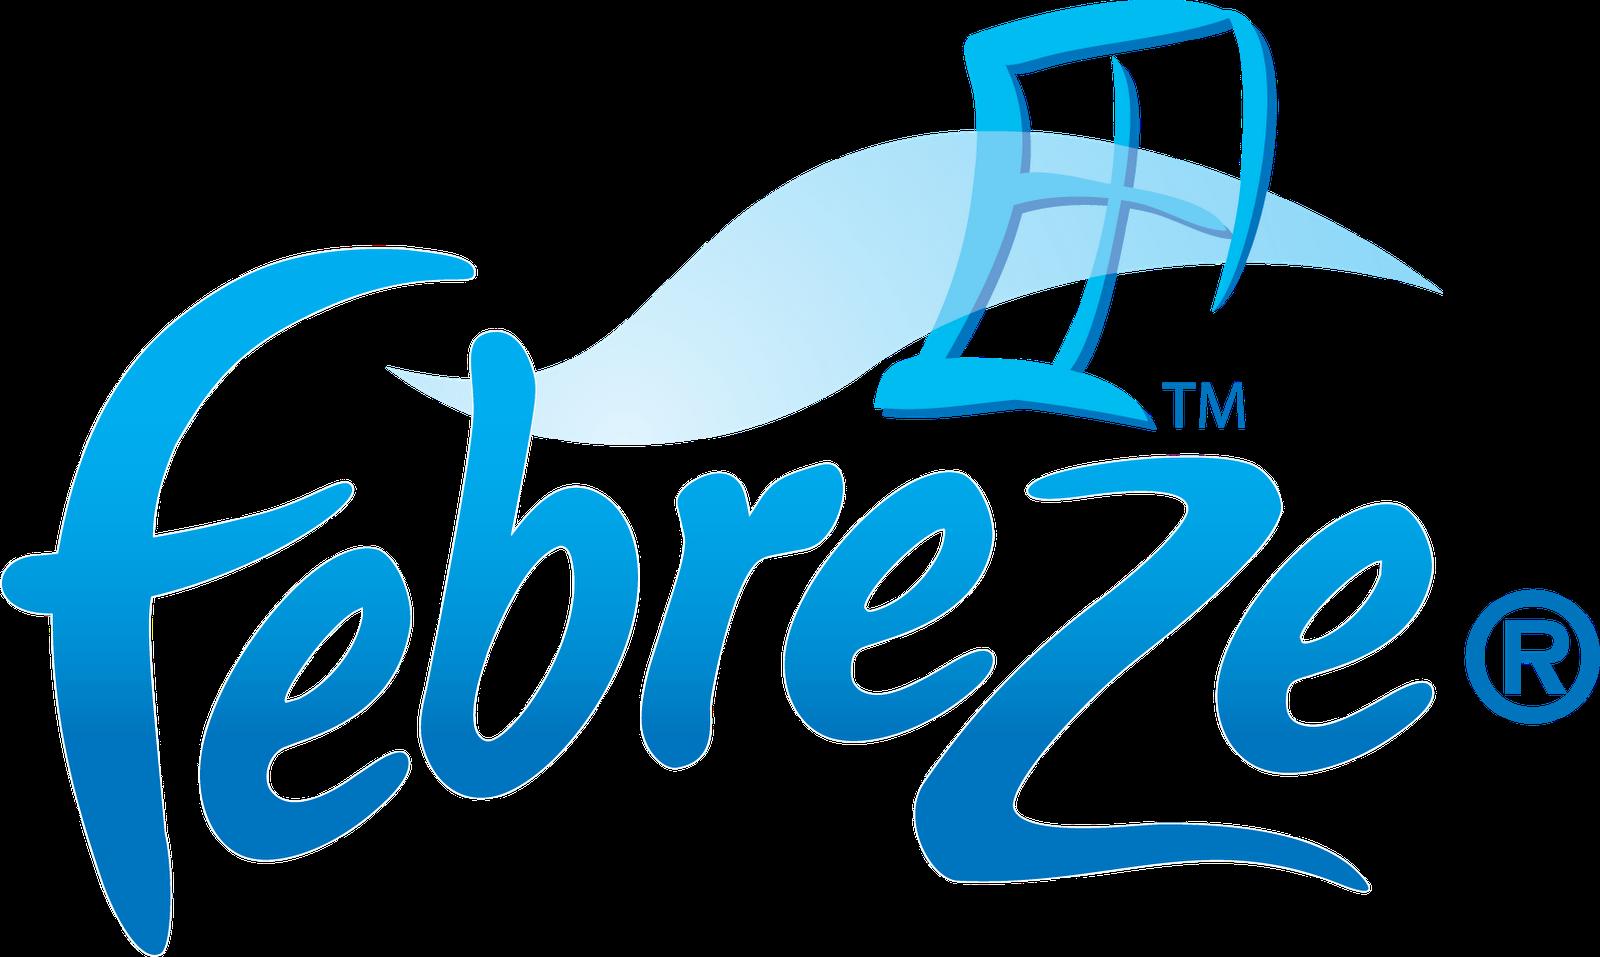 febreze logo 2015